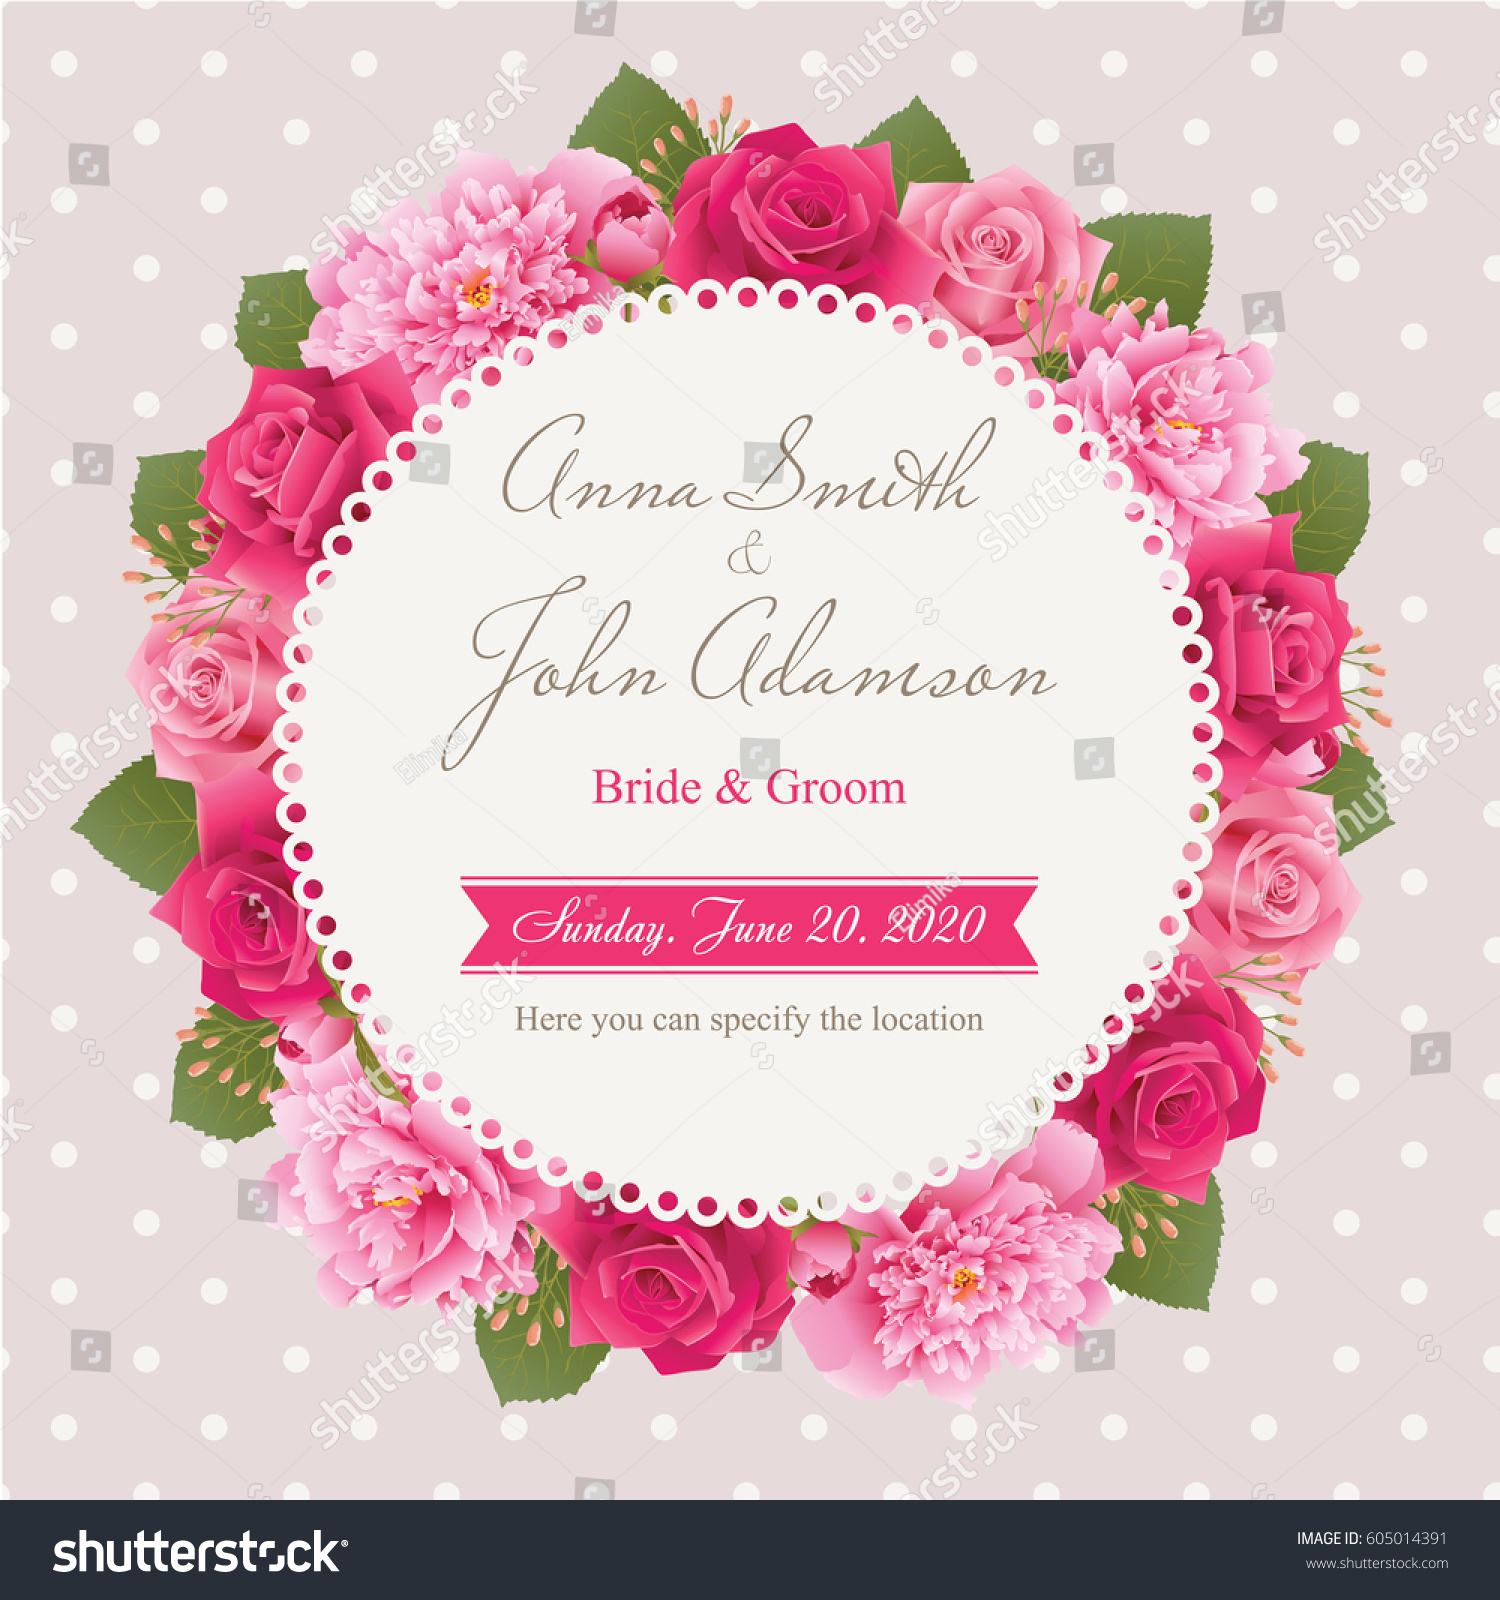 Wedding Invitation Card Save Date Card Stock Vector 605014391 ...